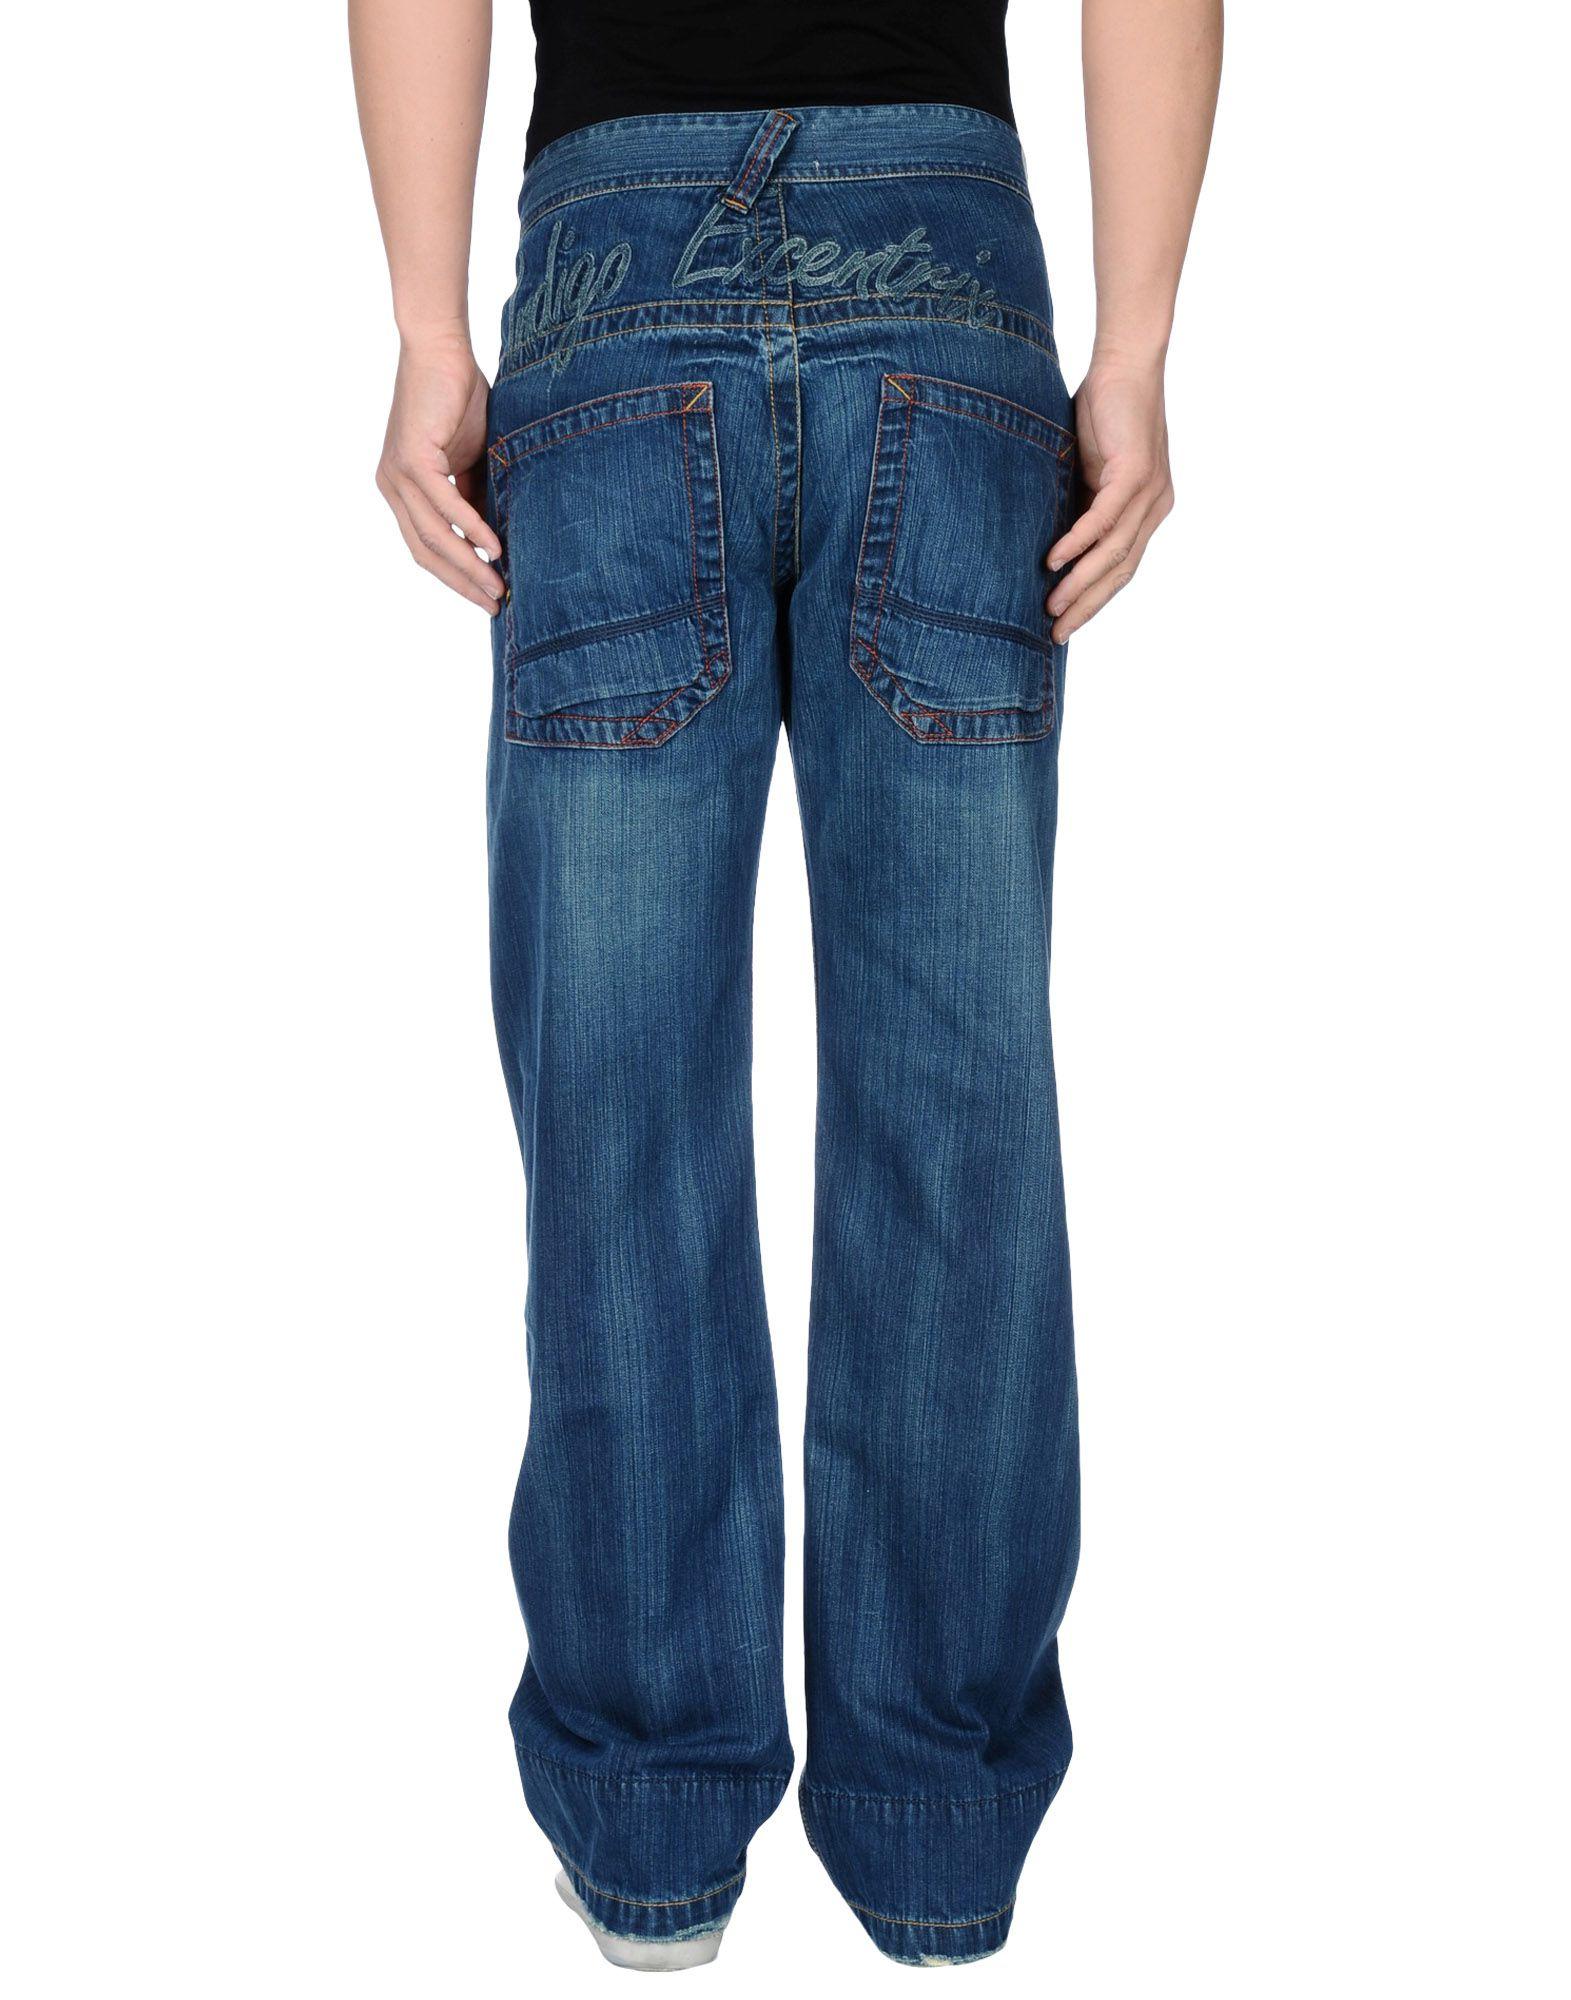 pepe jeans denim trousers in blue for men lyst. Black Bedroom Furniture Sets. Home Design Ideas